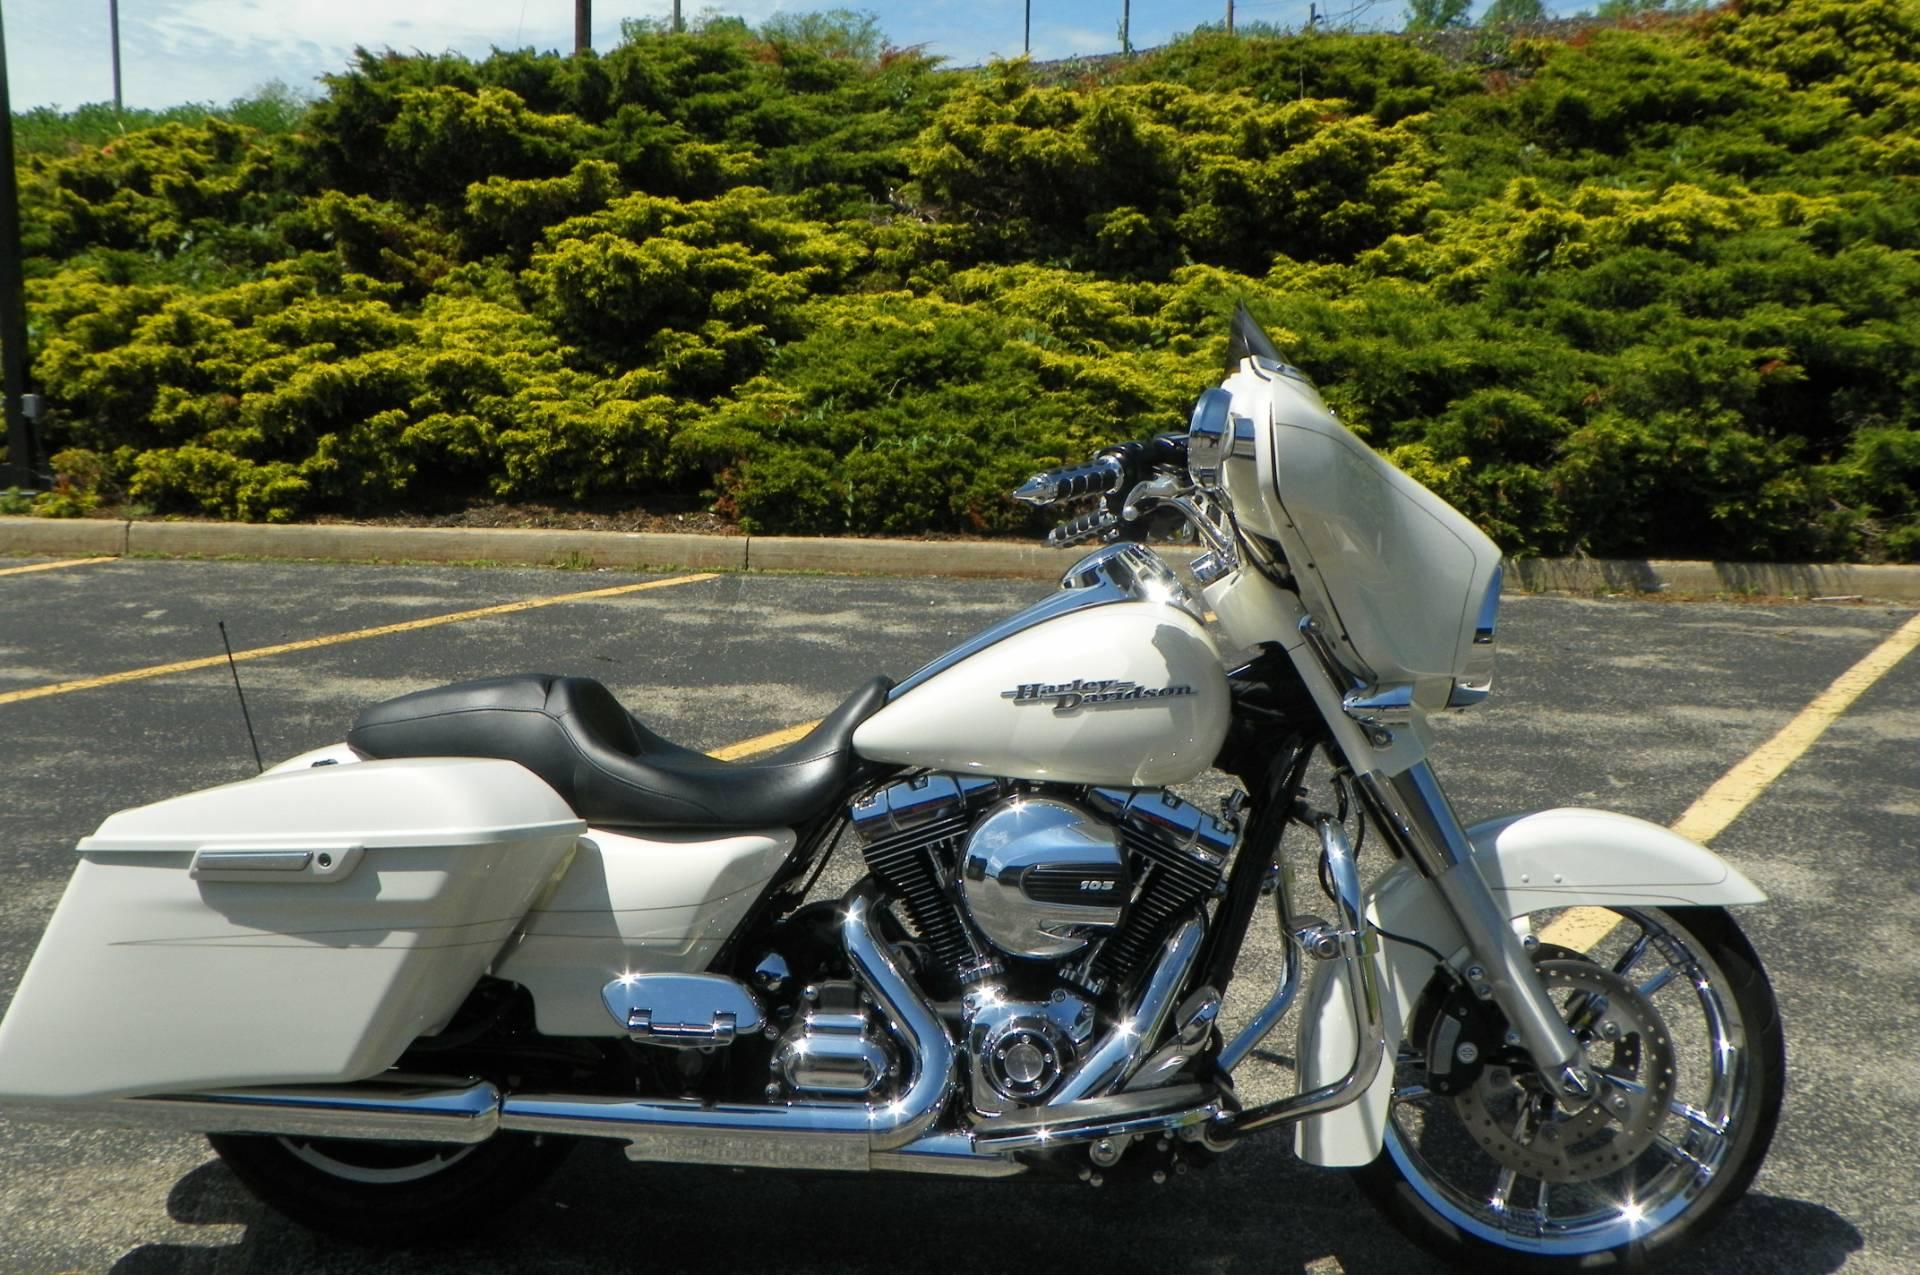 2015 Harley-Davidson Street Glide Special 1